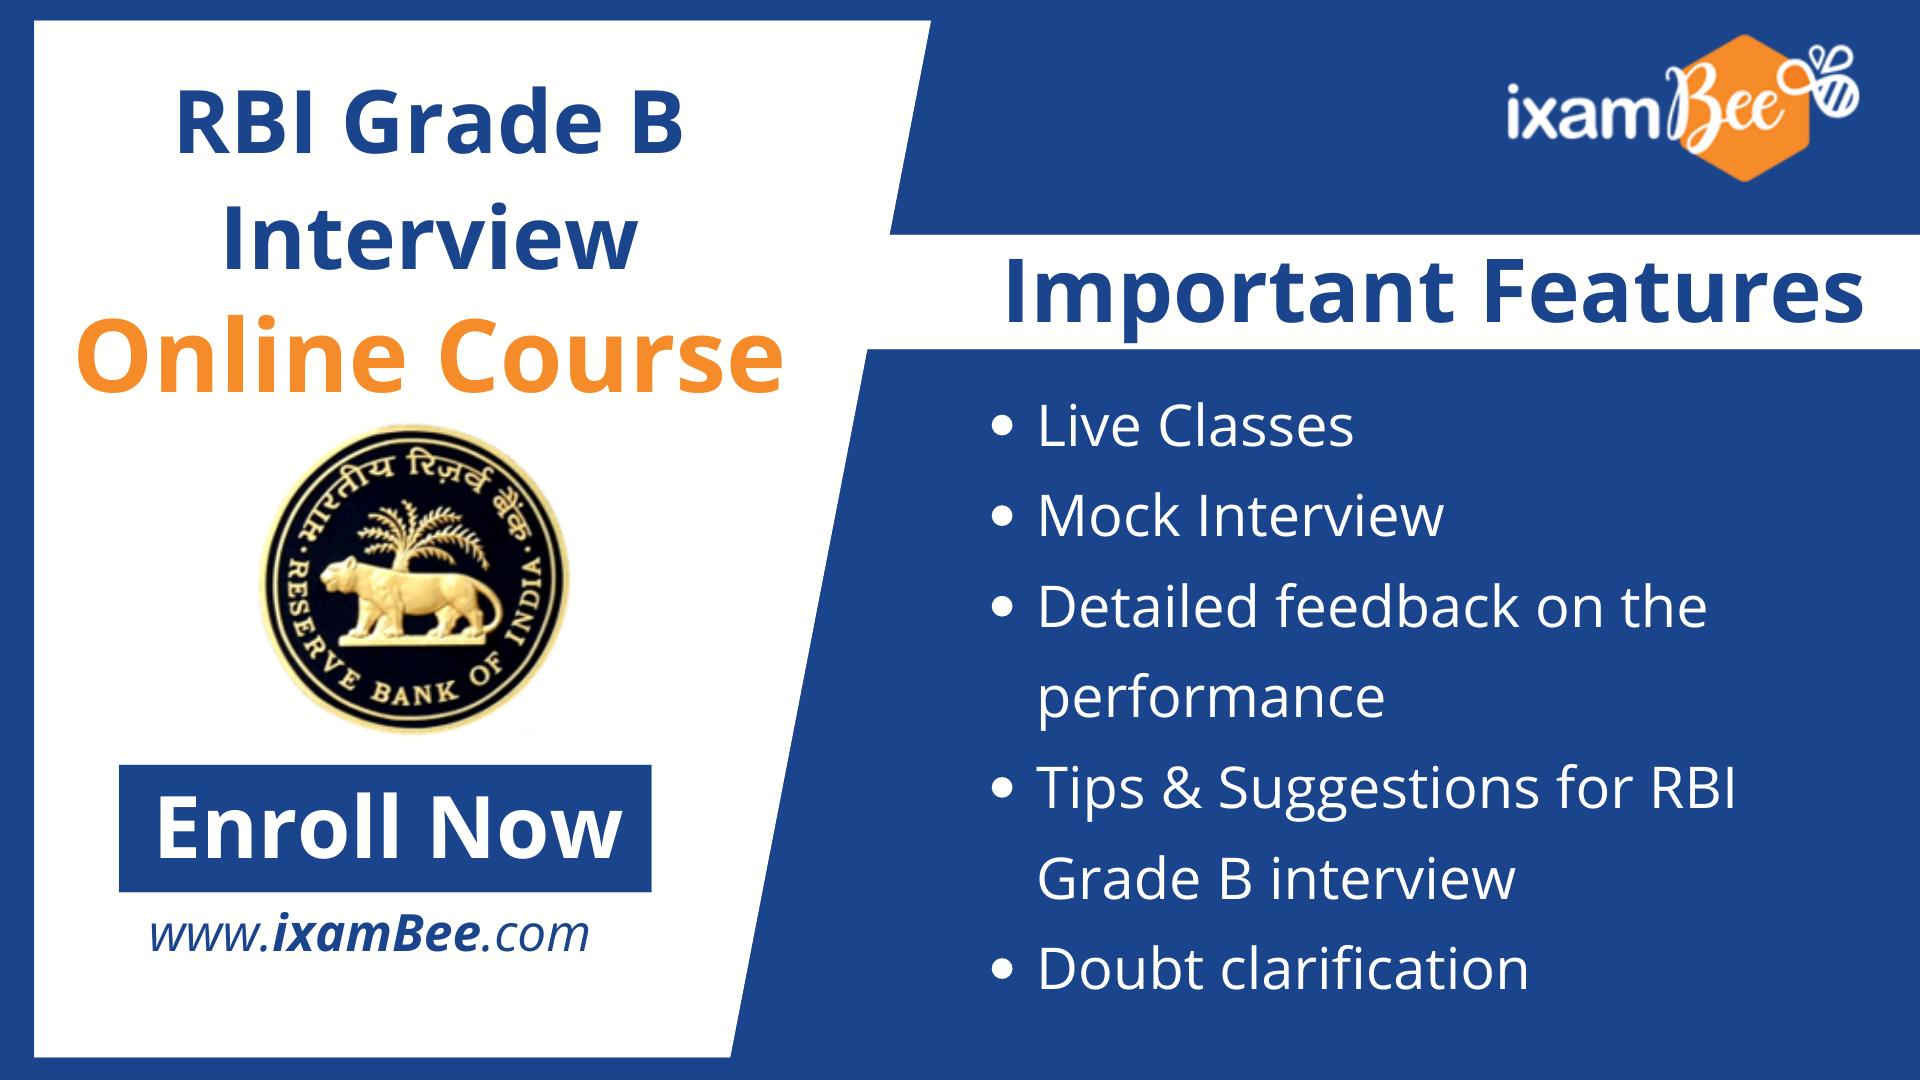 rbi grade b interview course